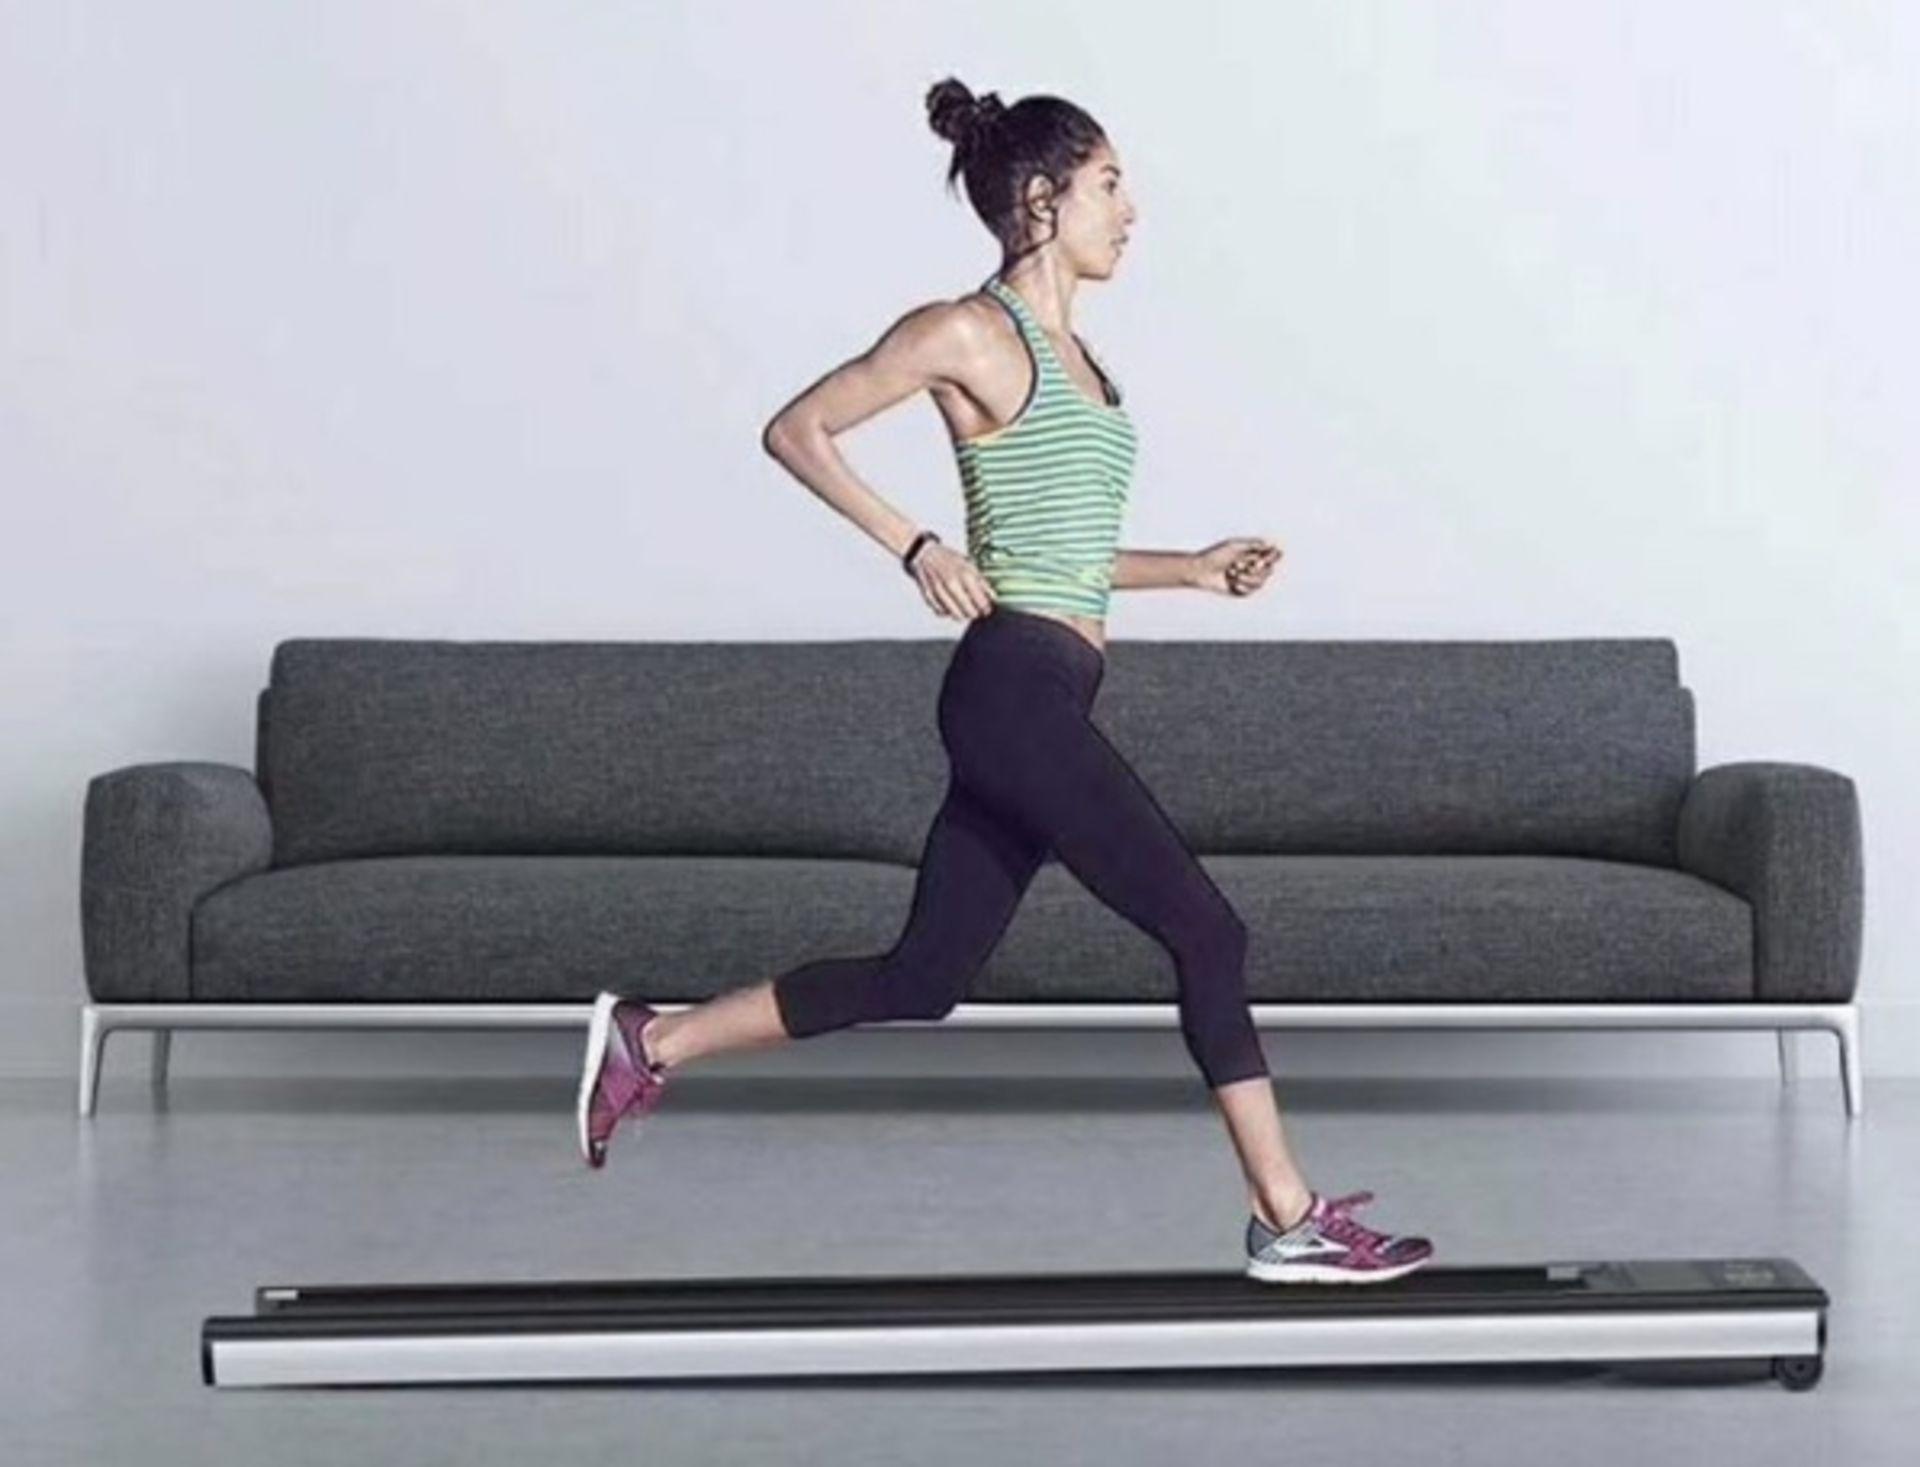 1 x Slim Tread Ultra Thin Smart Treadmill Running / Walking Machine - Lightweight With Folding - Image 11 of 19